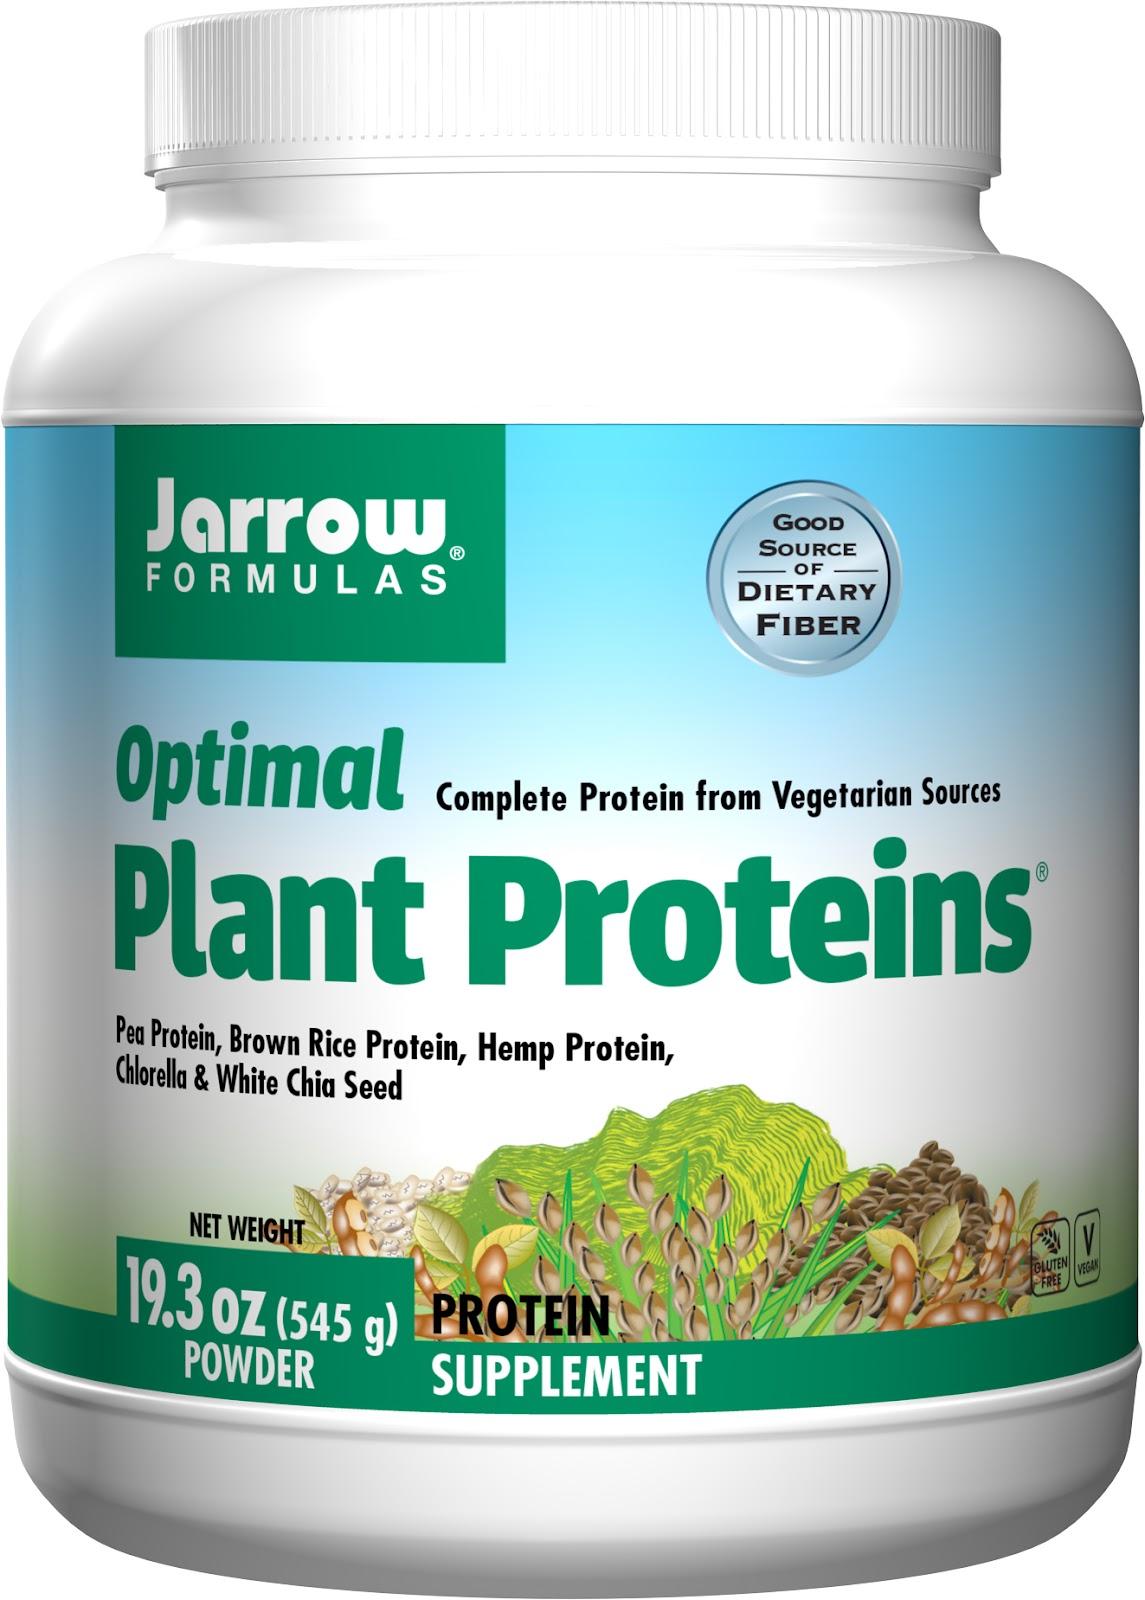 The 10 Best Hemp Protein Powder DumbbellsReview.com